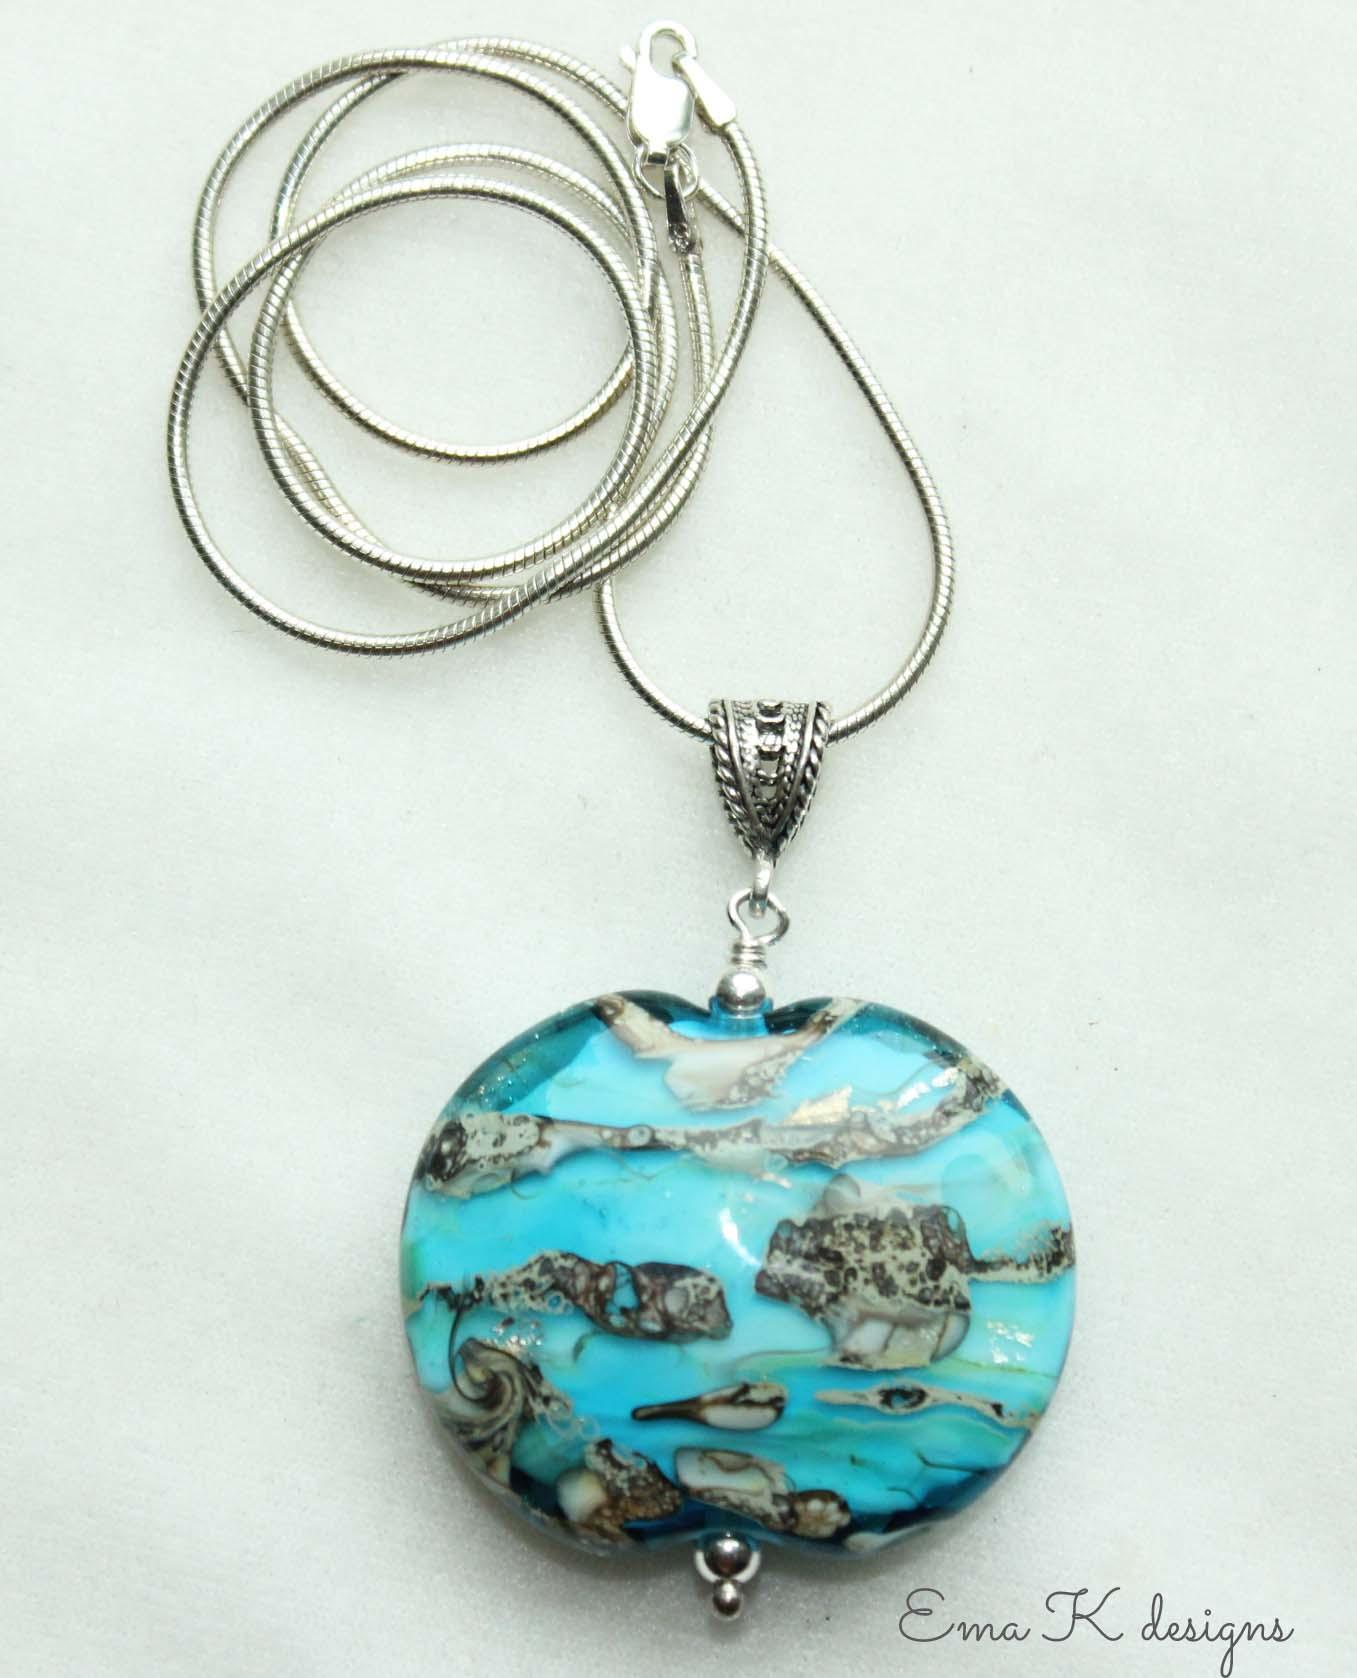 Art bead strung on a silver pendant